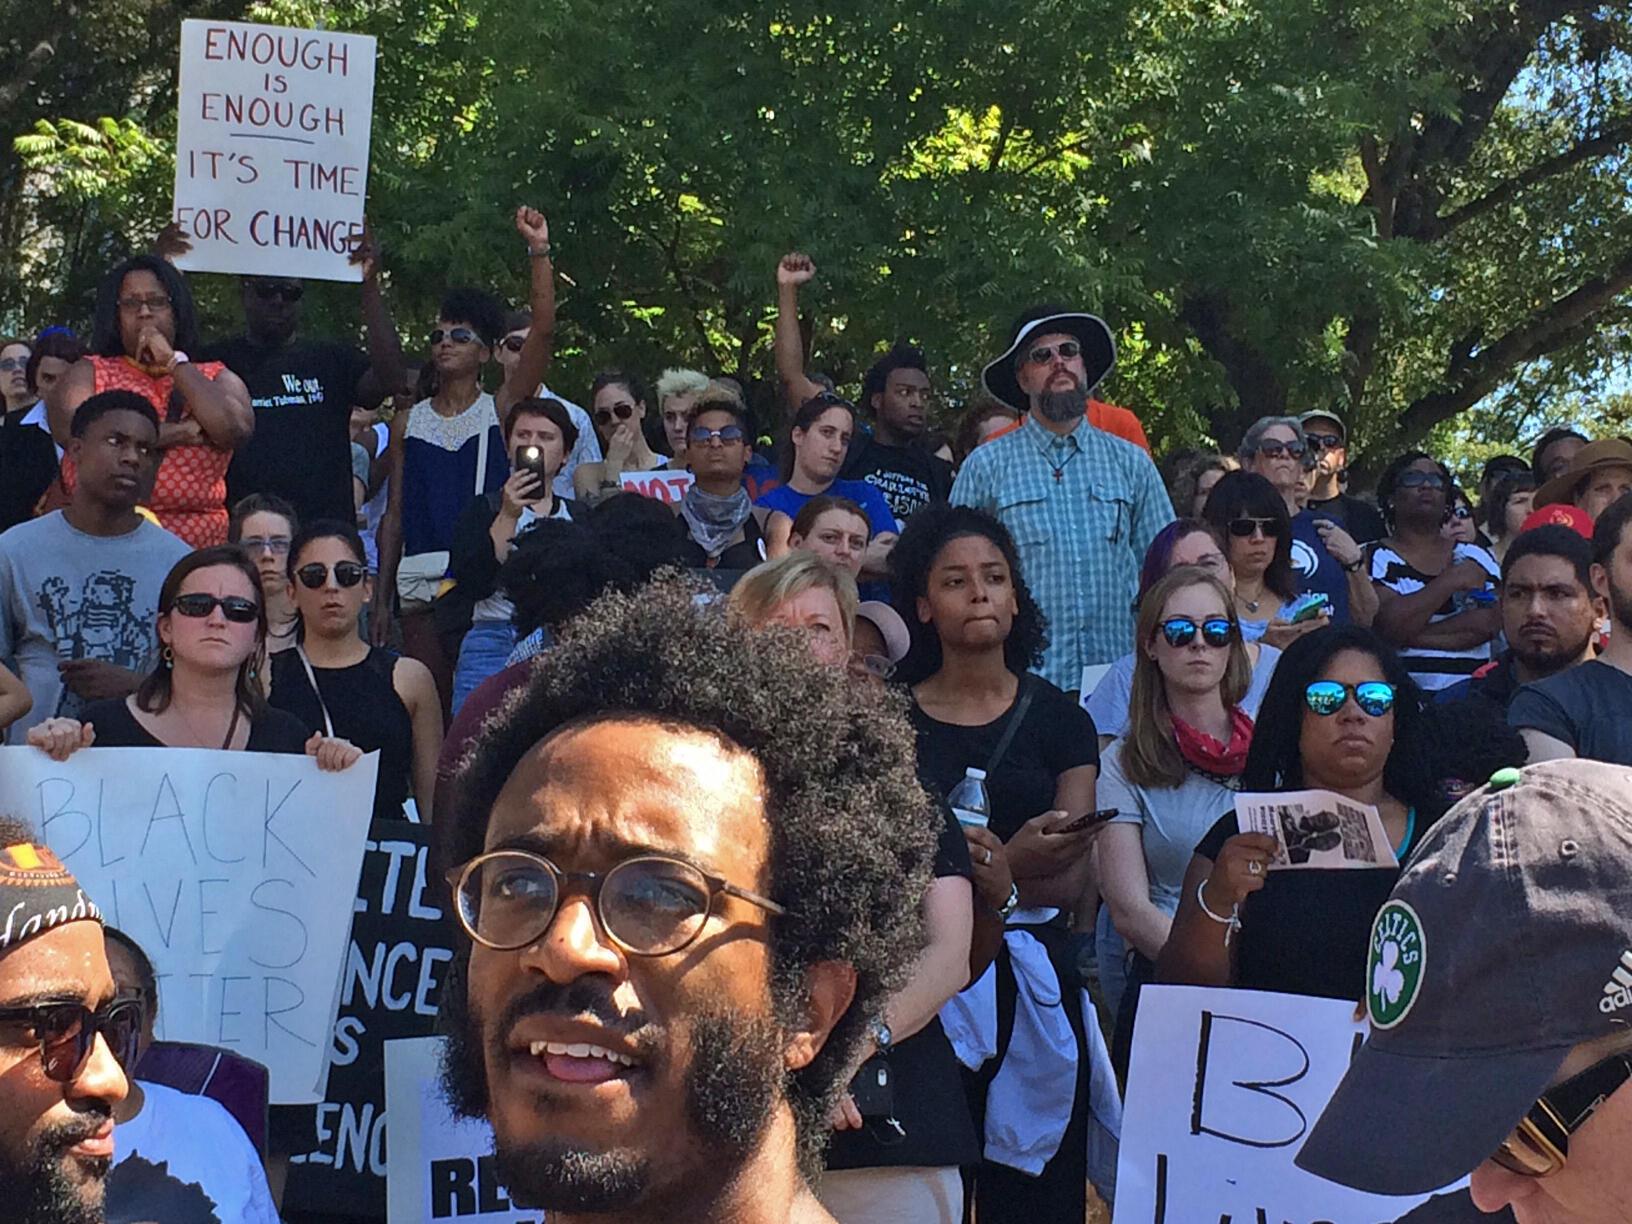 Rassemblement au parc Marshall  ce samedi après-midi, 24 septembre 2016.